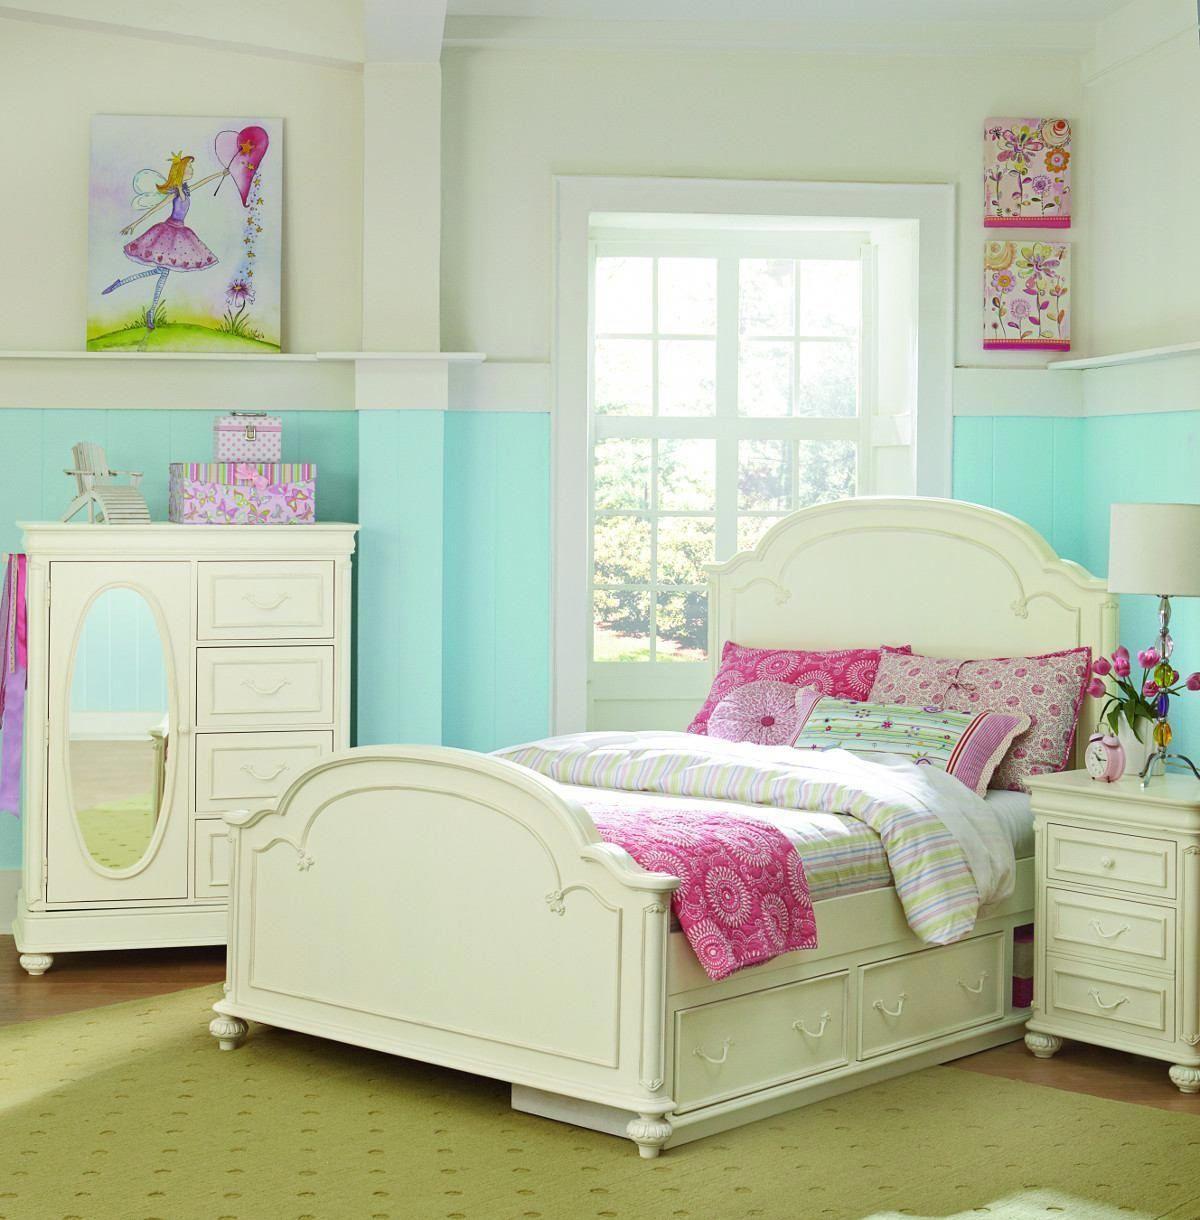 Shipping Furniture To Canada Furnituredisposal Girls Bedroom